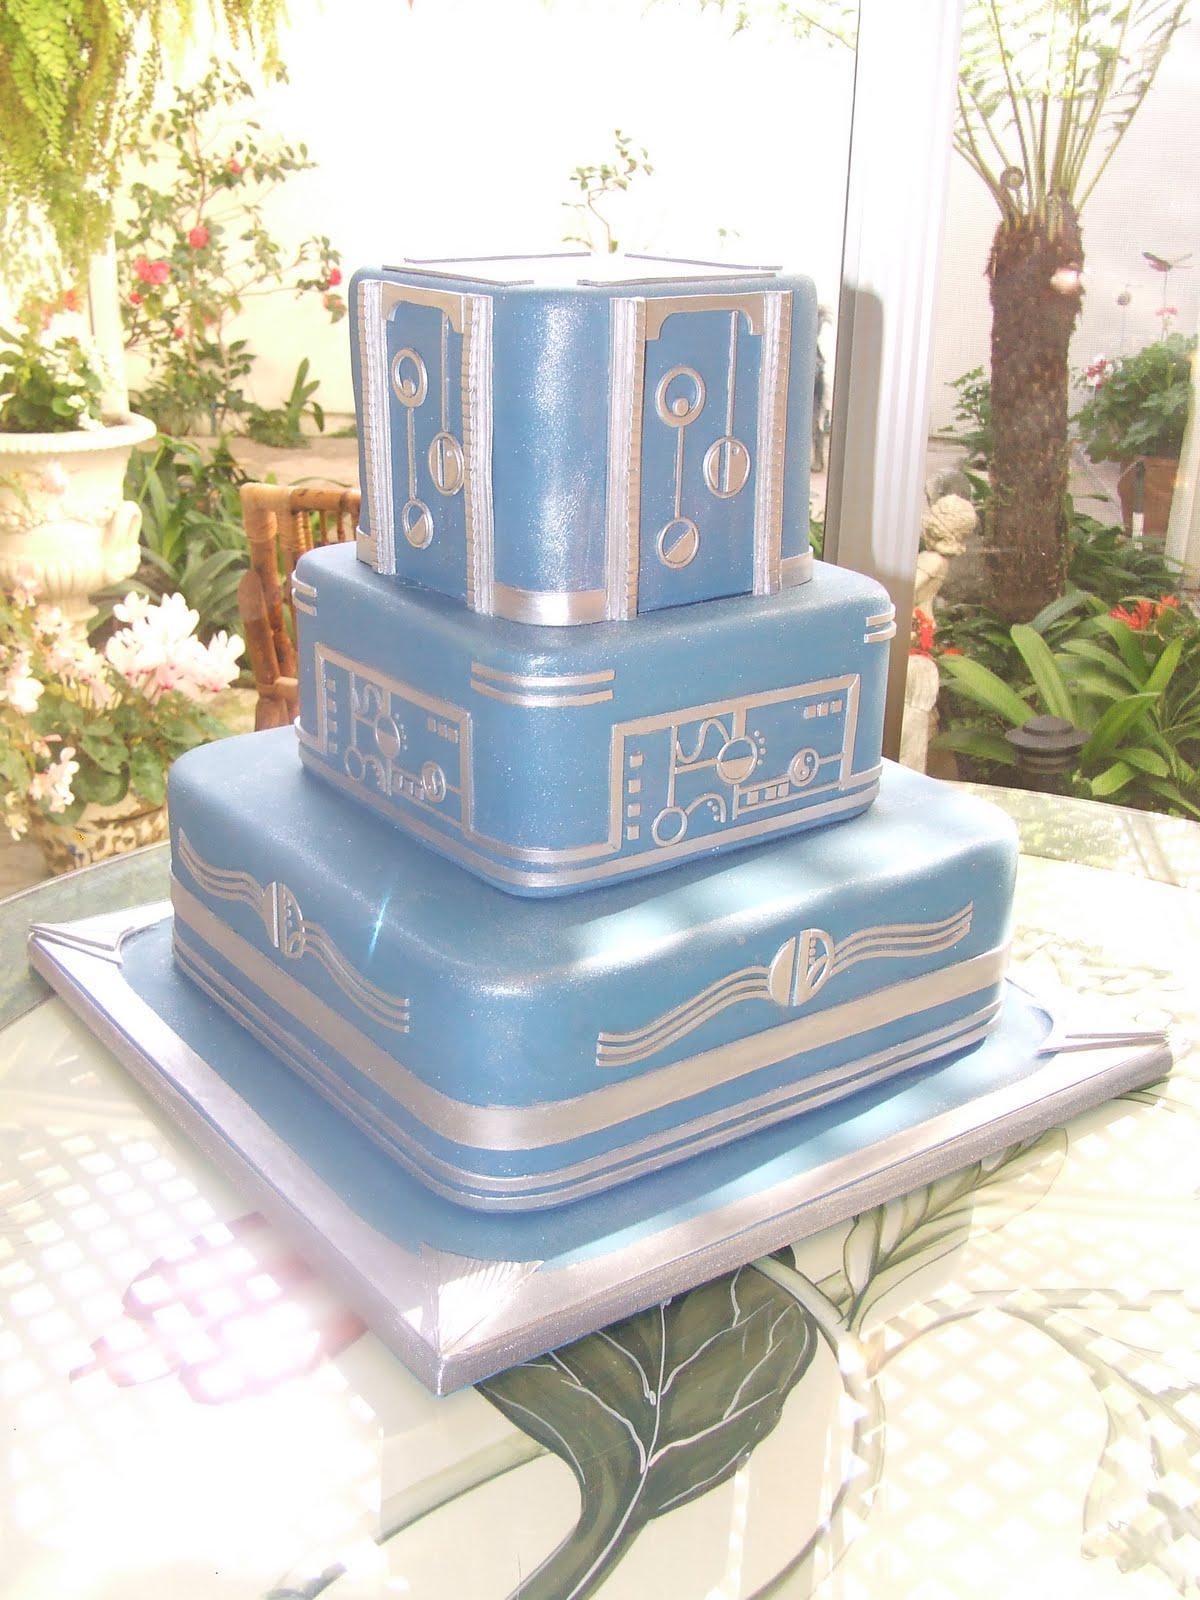 Art Deco-style cake